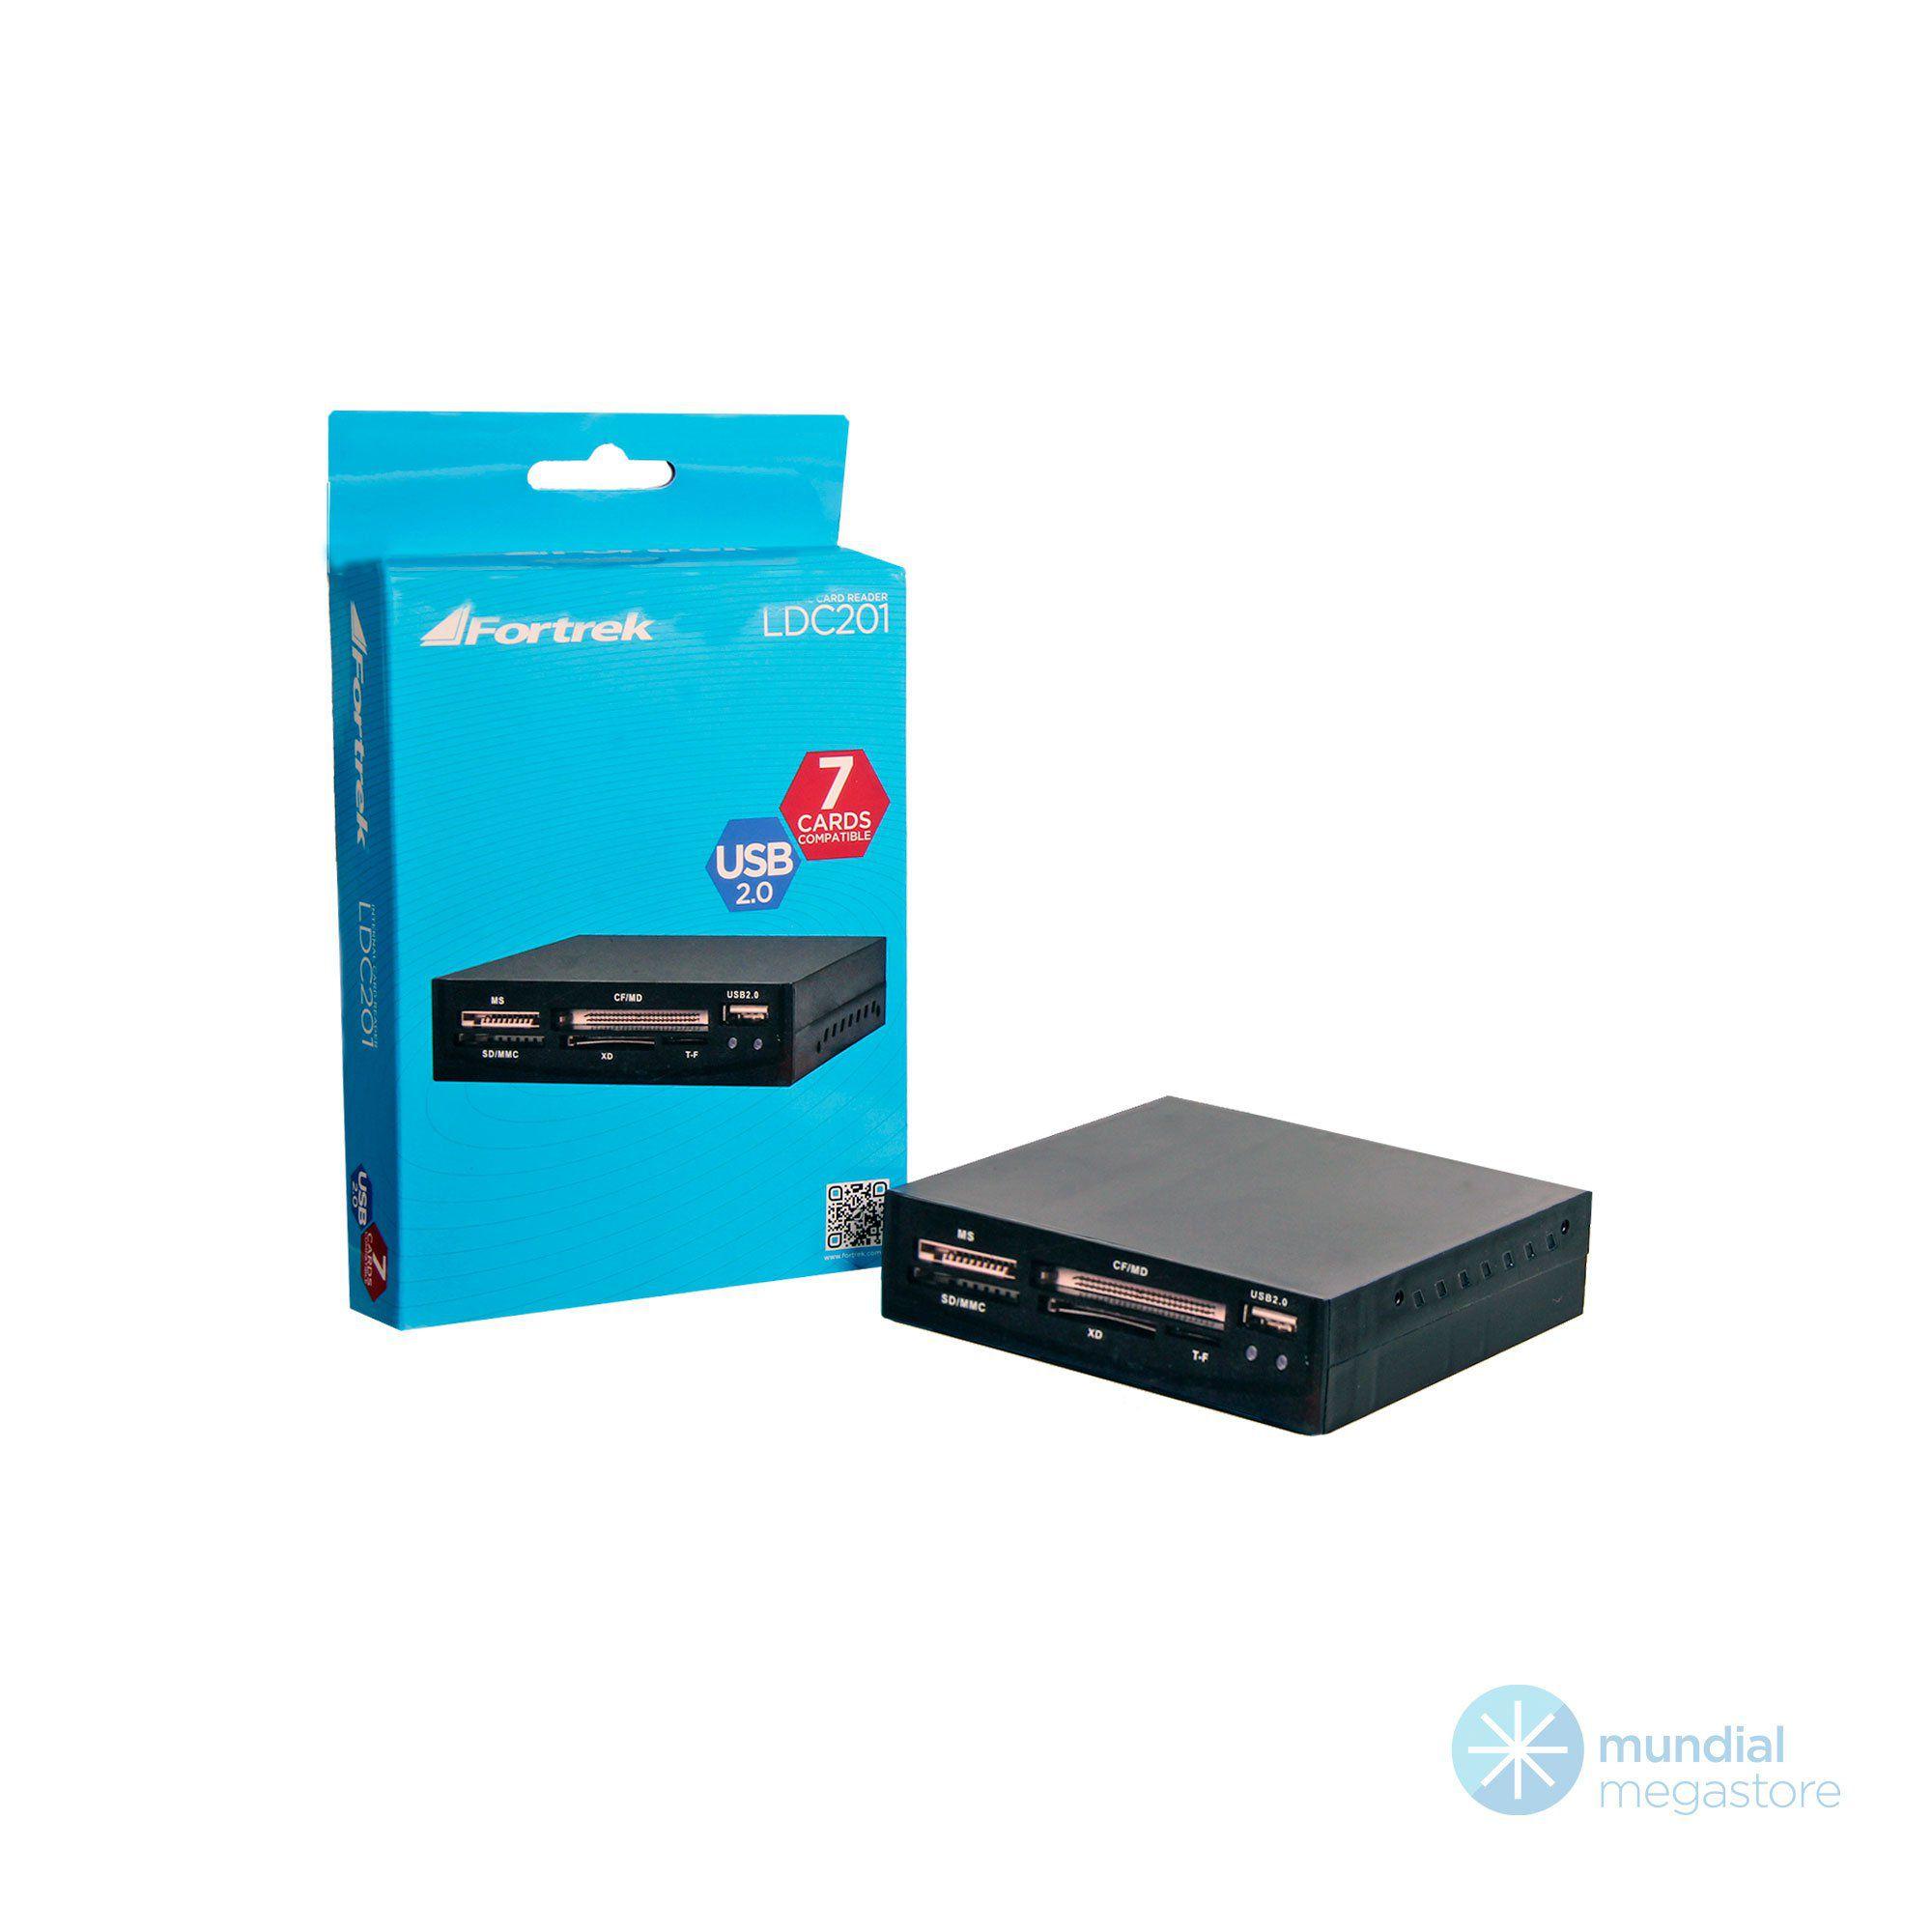 LEITOR DE CARTÕES INTERNO PARA DESKTOP - USB 2.0 LDC201 FORTREK